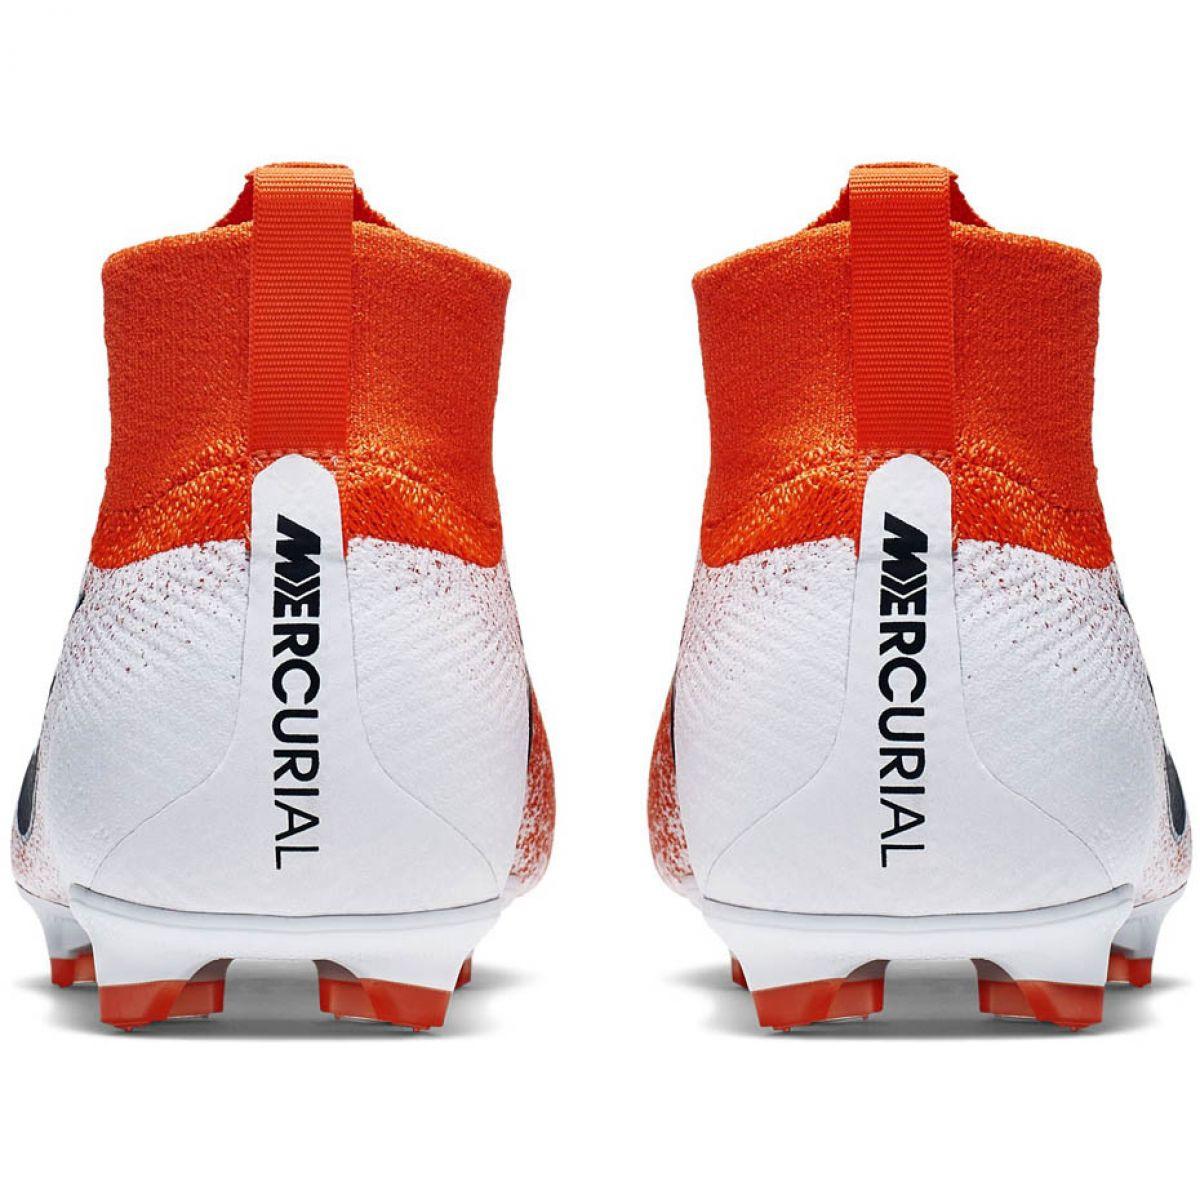 Chuteira Nike Mercurial Superfly 6 FG Elite BrancoLaranja